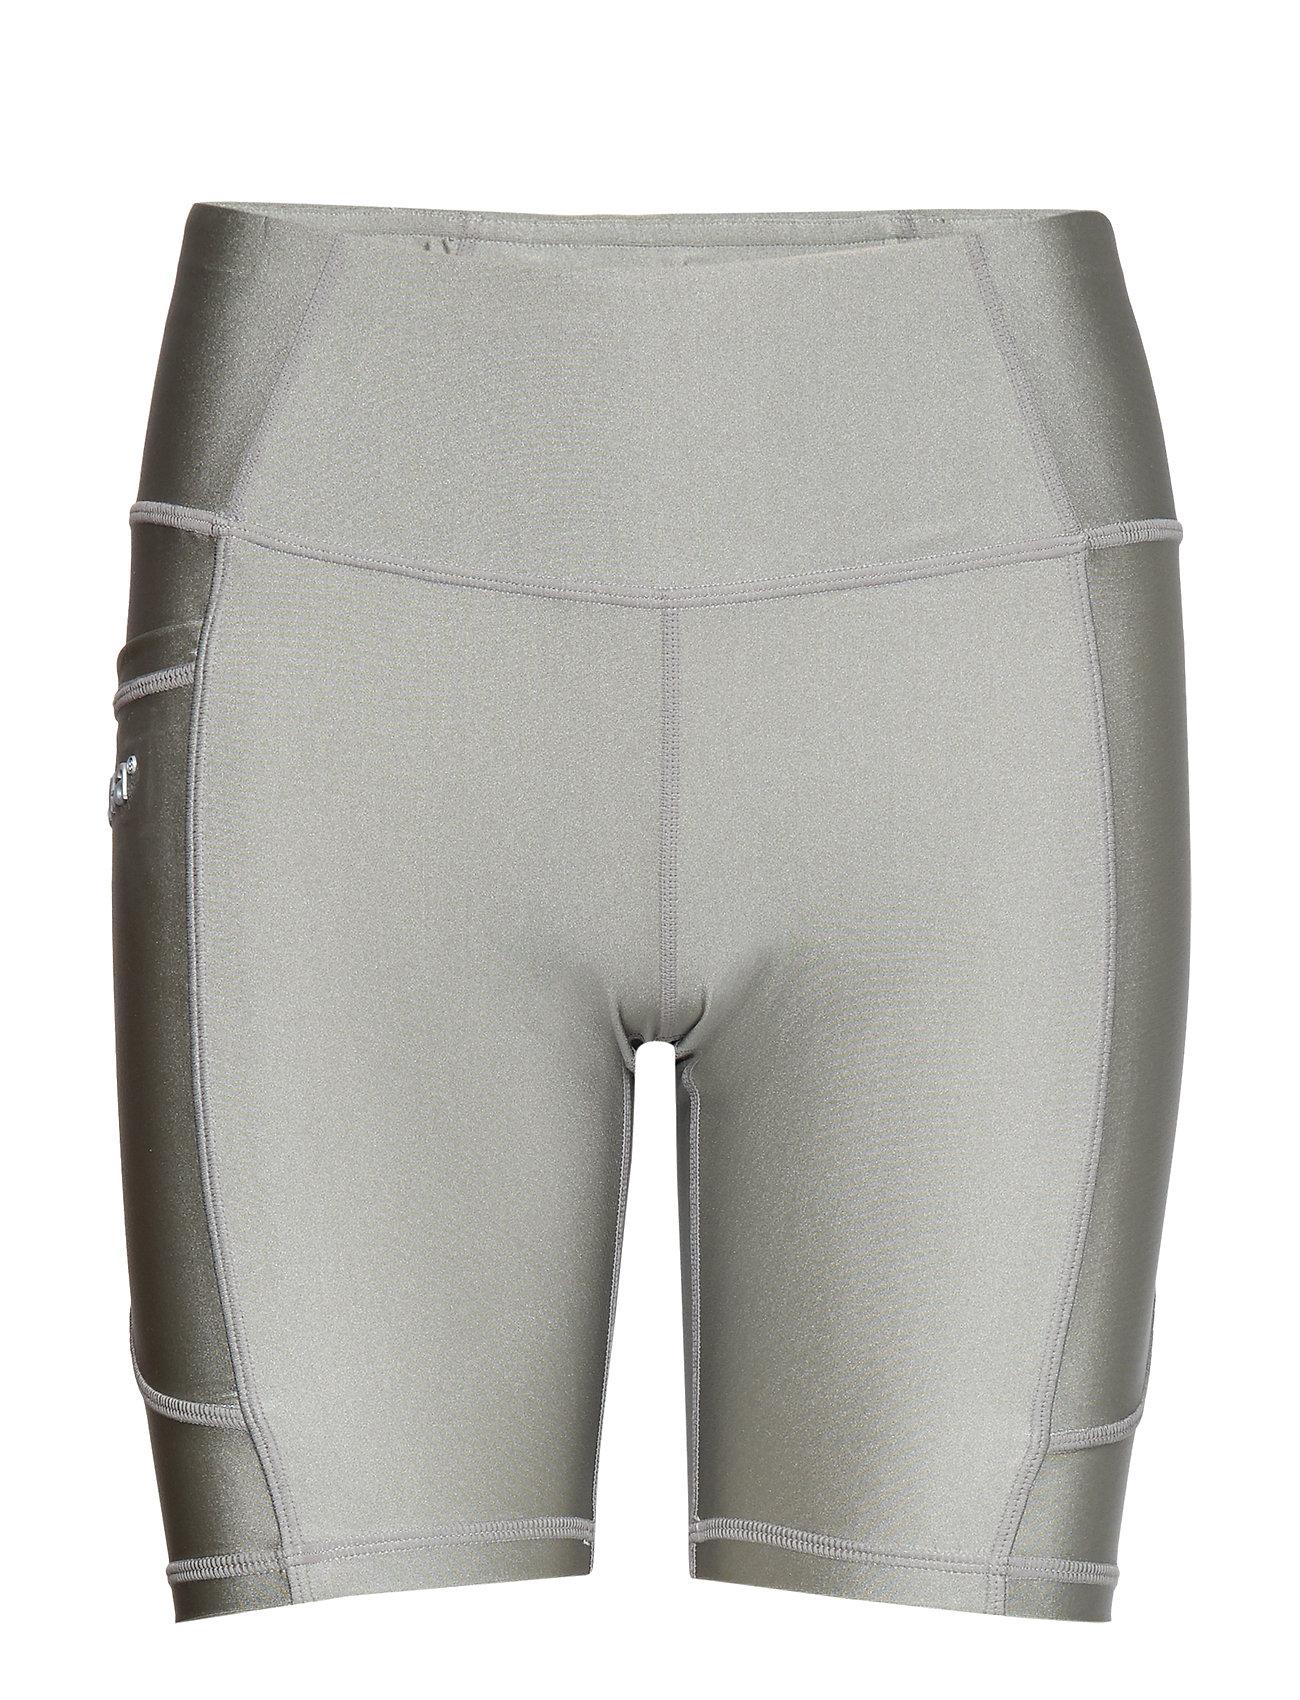 Svea Svea Sport Shorts - SILVER